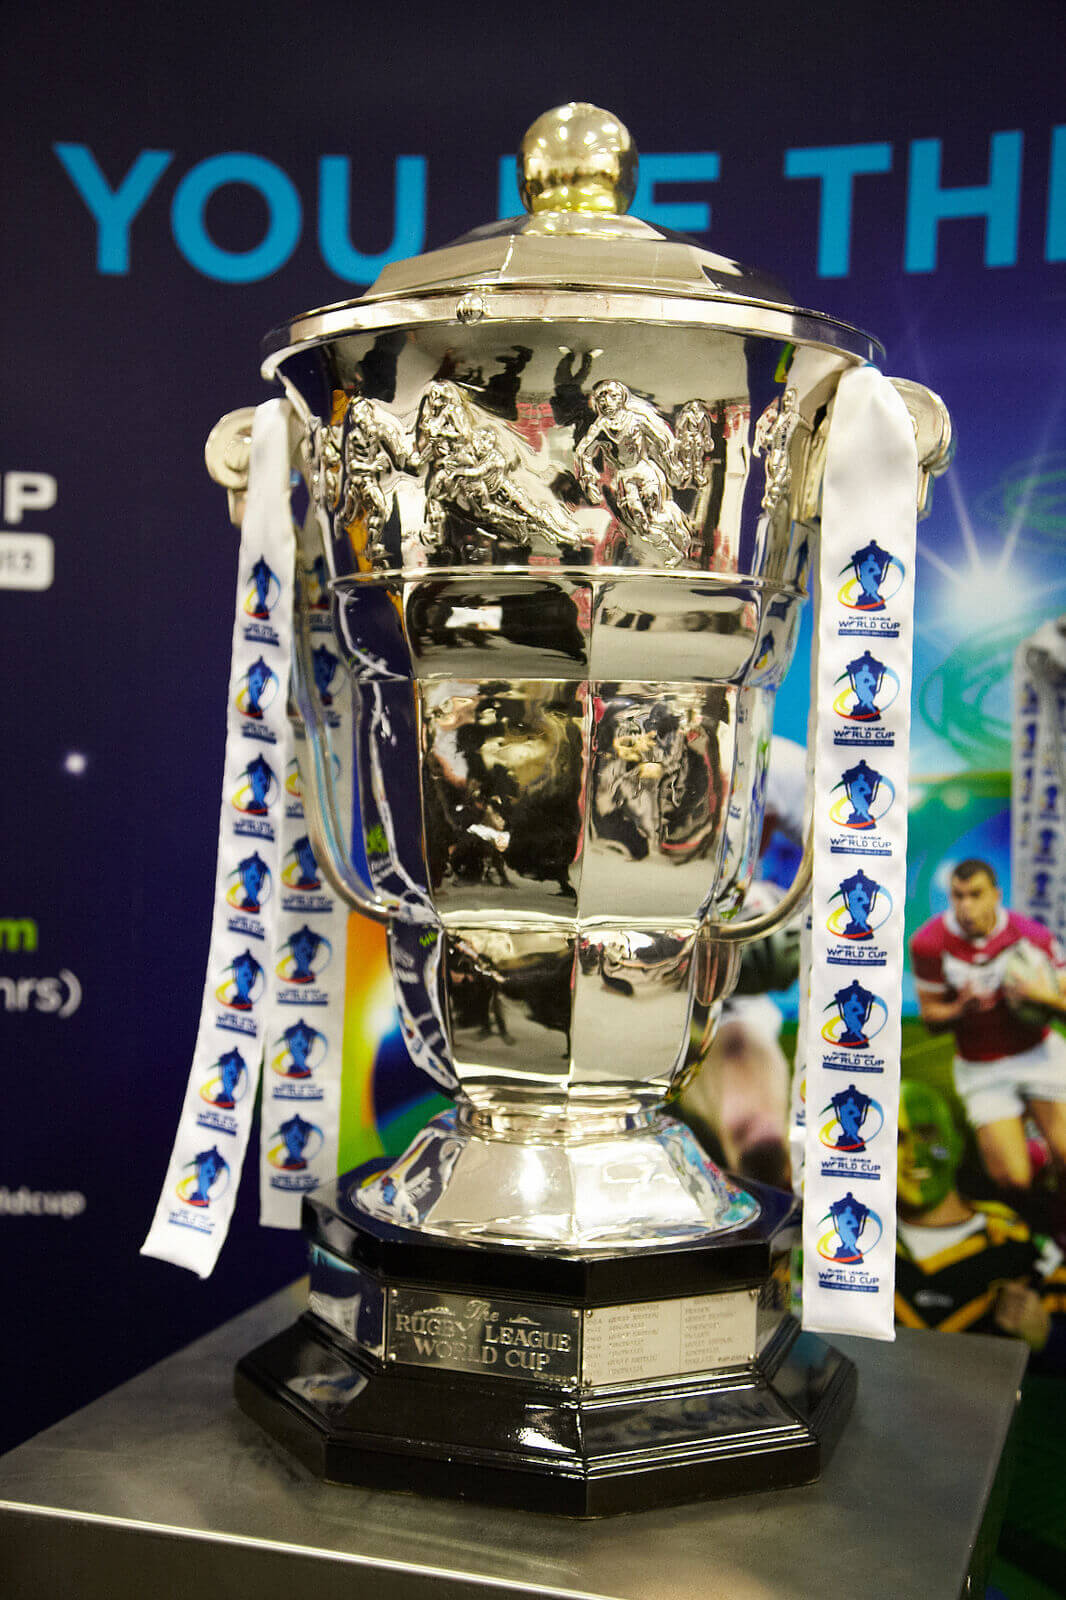 Coppa-del-Mondo-Rugby-a-13-2017-cup